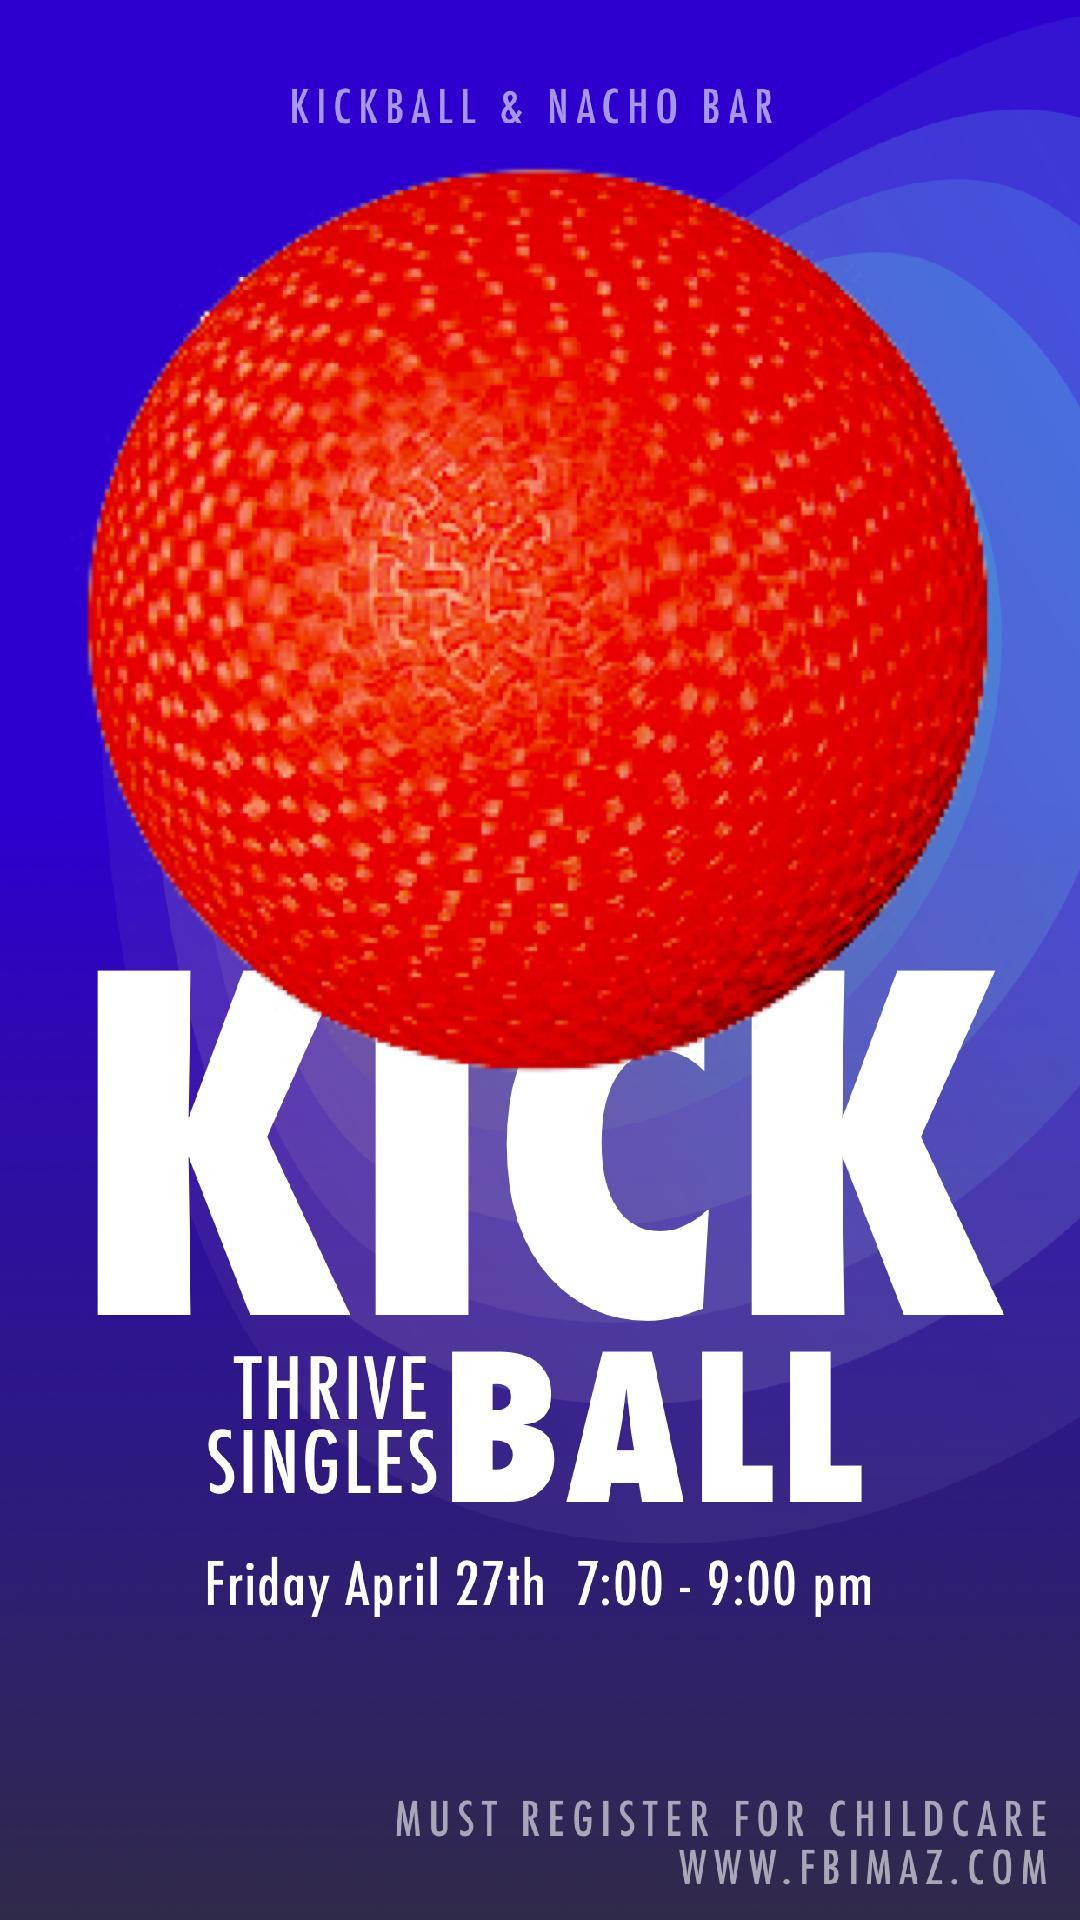 Thrive Singles Kickball - Friday, April 27th 7:00 pm - 9:00 pm